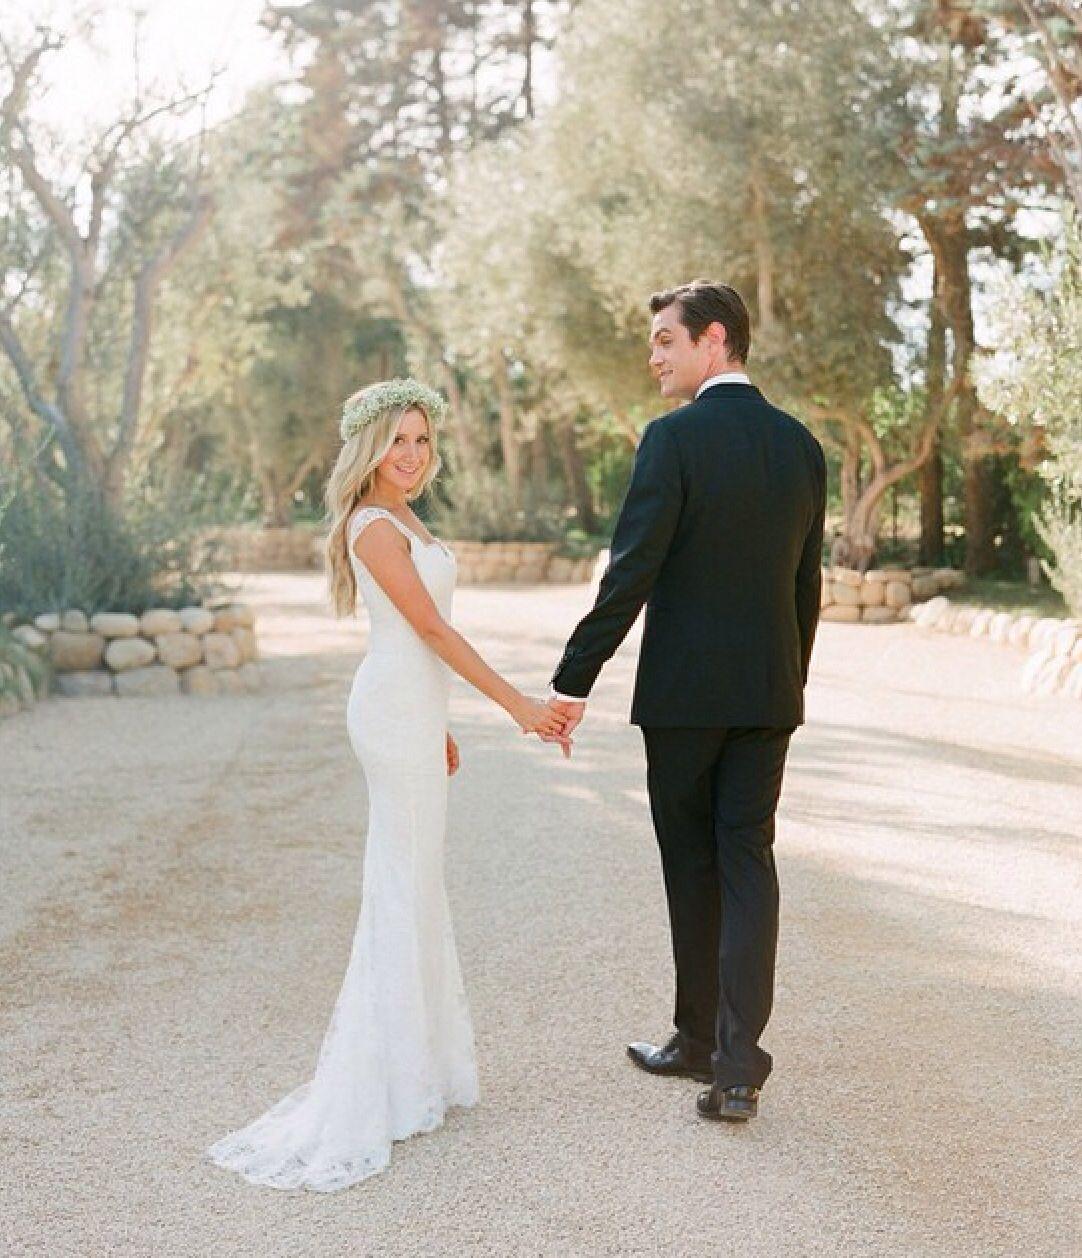 Valentino wedding dress  Ashley Tisdale Wedding  Little Girl Dreams  Pinterest  Ashley